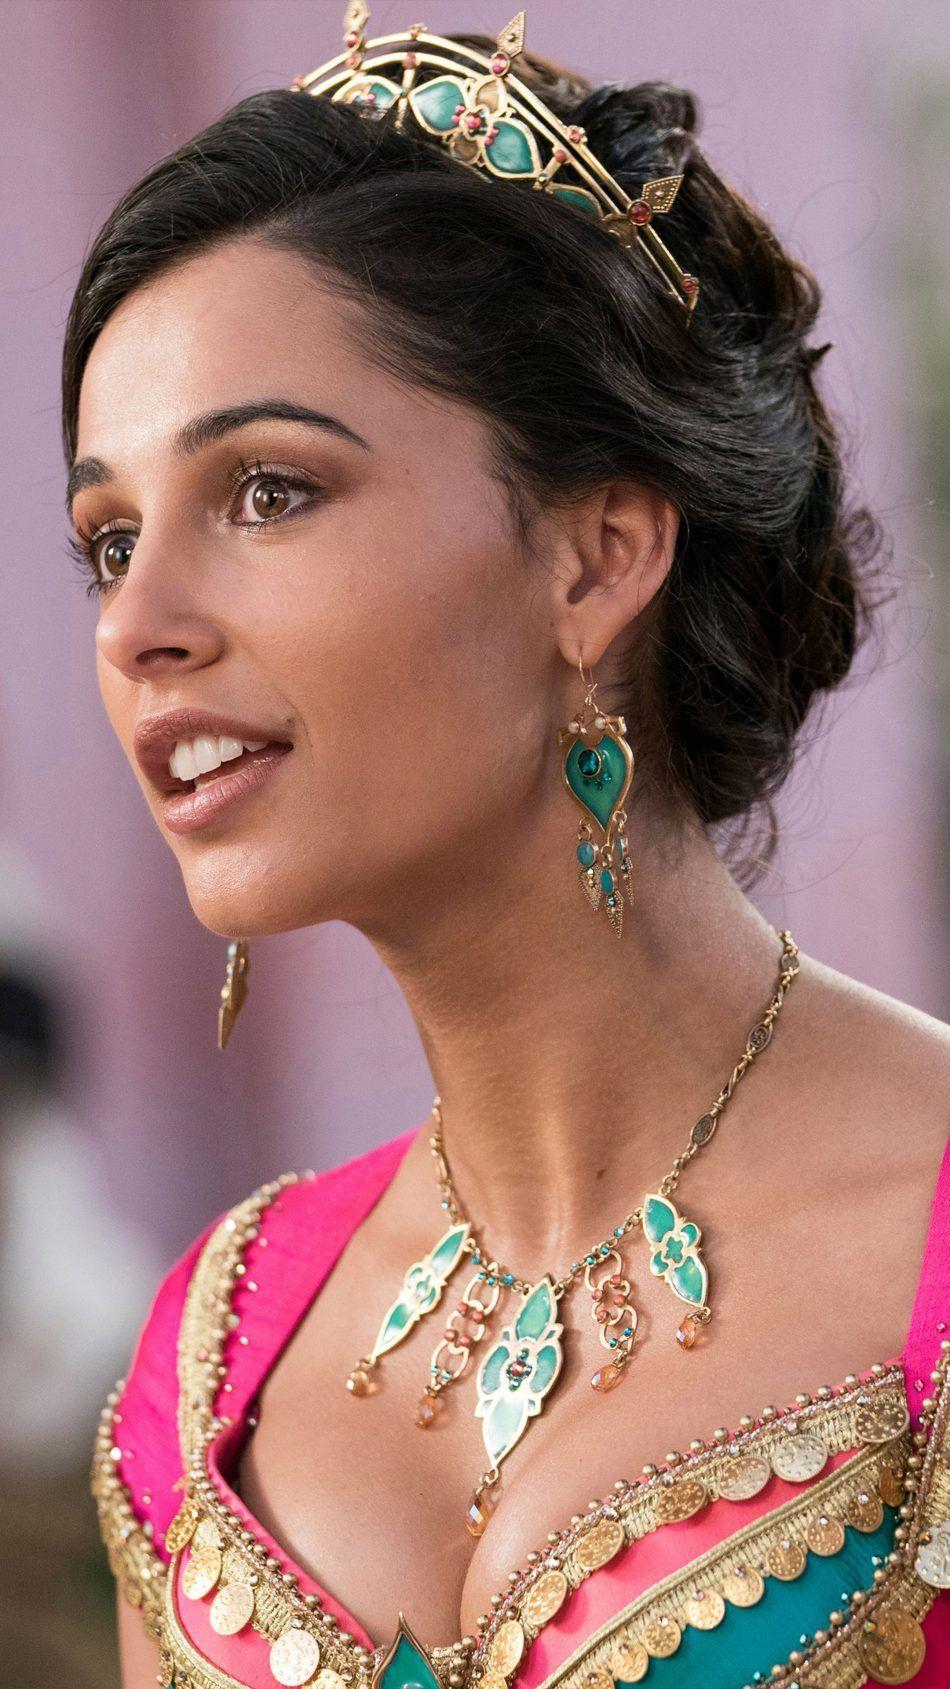 Naomi Scott As Princess Jasmine In Aladdin 2019 Movie Wallpapers 950x1689